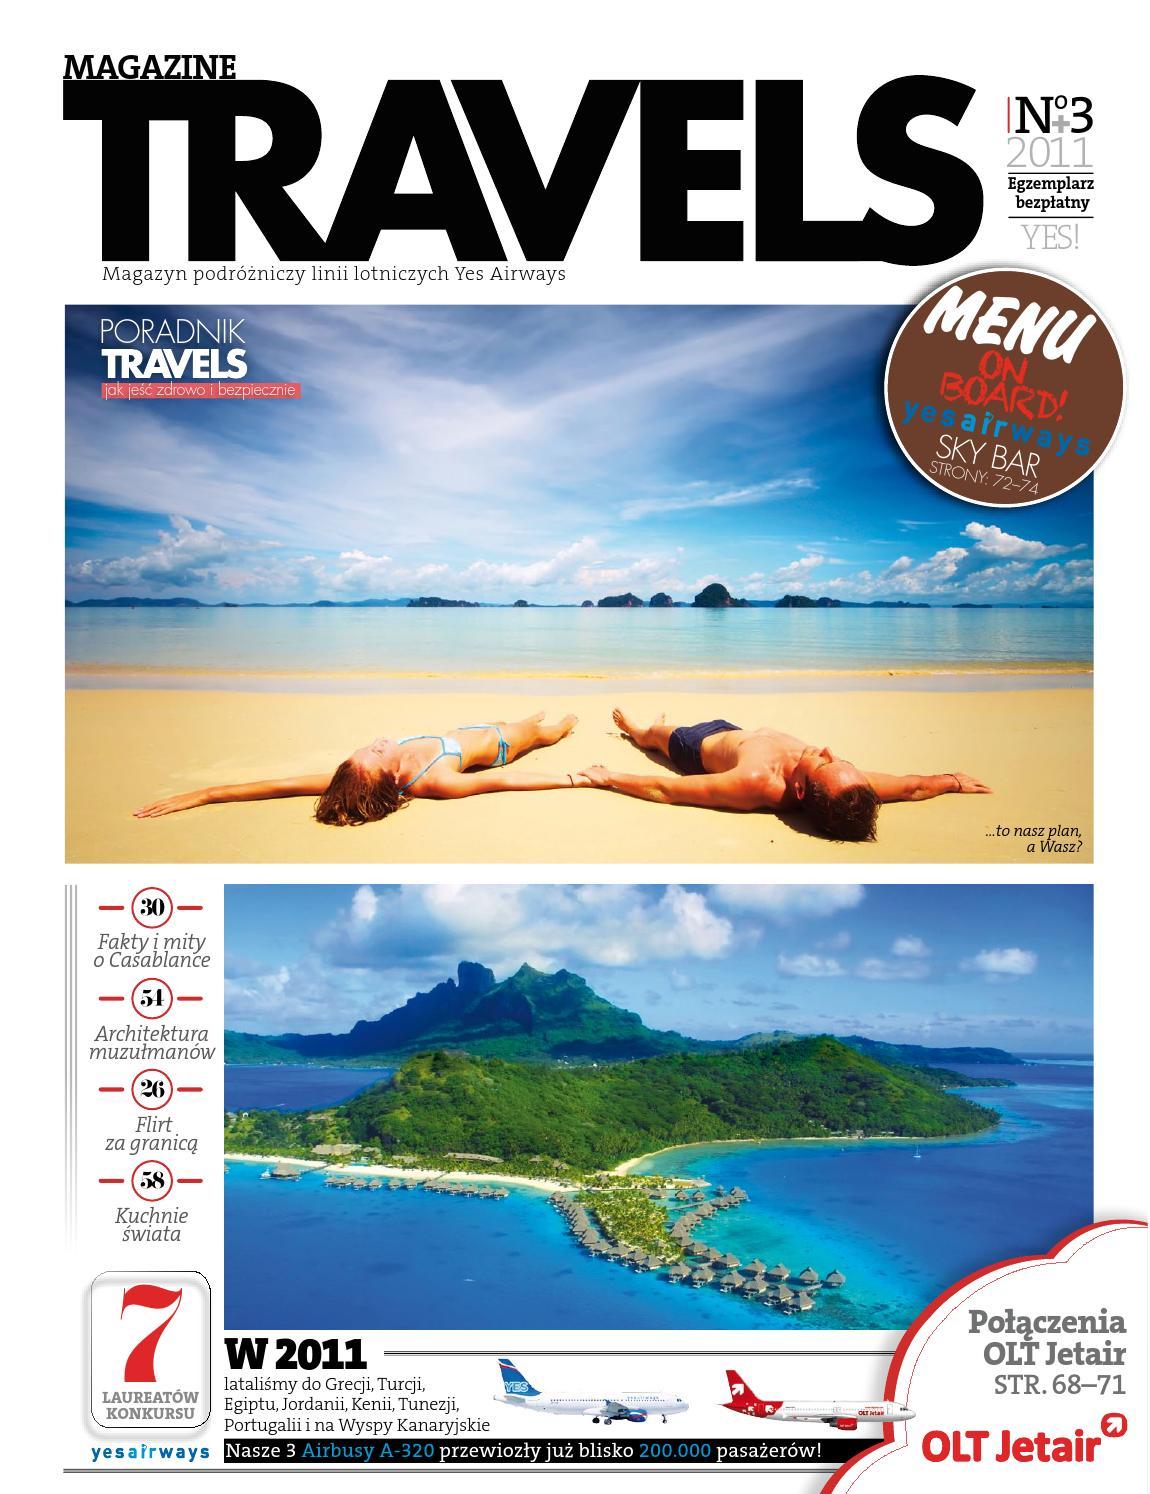 Travels Magazine 03 By Wydawnictwo Mediadore Issuu